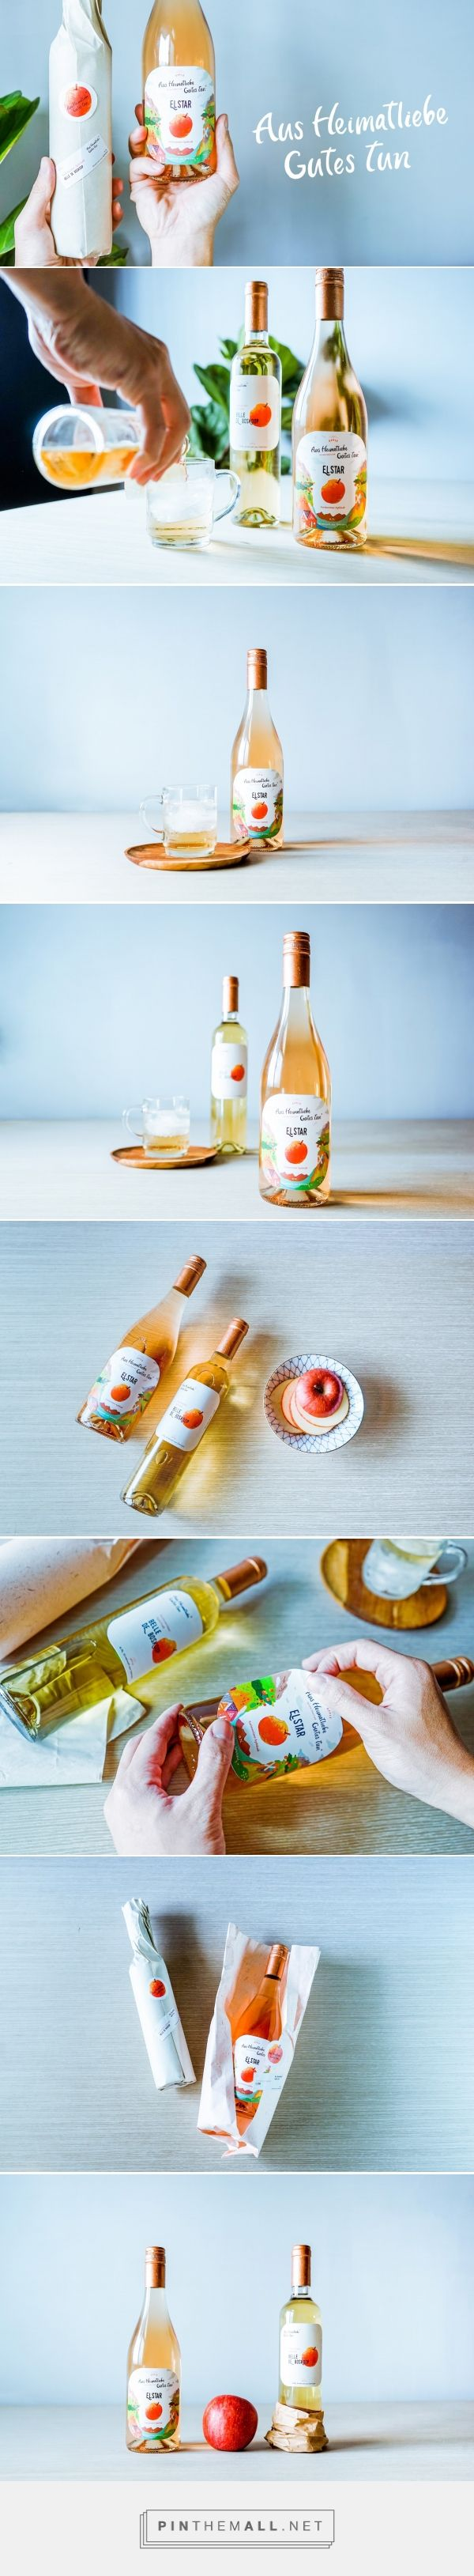 Aus Heimatliebe Gutes tun Apple Juice Tender - Packaging of the World - Creative Package Design Gallery - http://www.packagingoftheworld.com/2017/03/aus-heimatliebe-gutes-tun-apple-juice.html